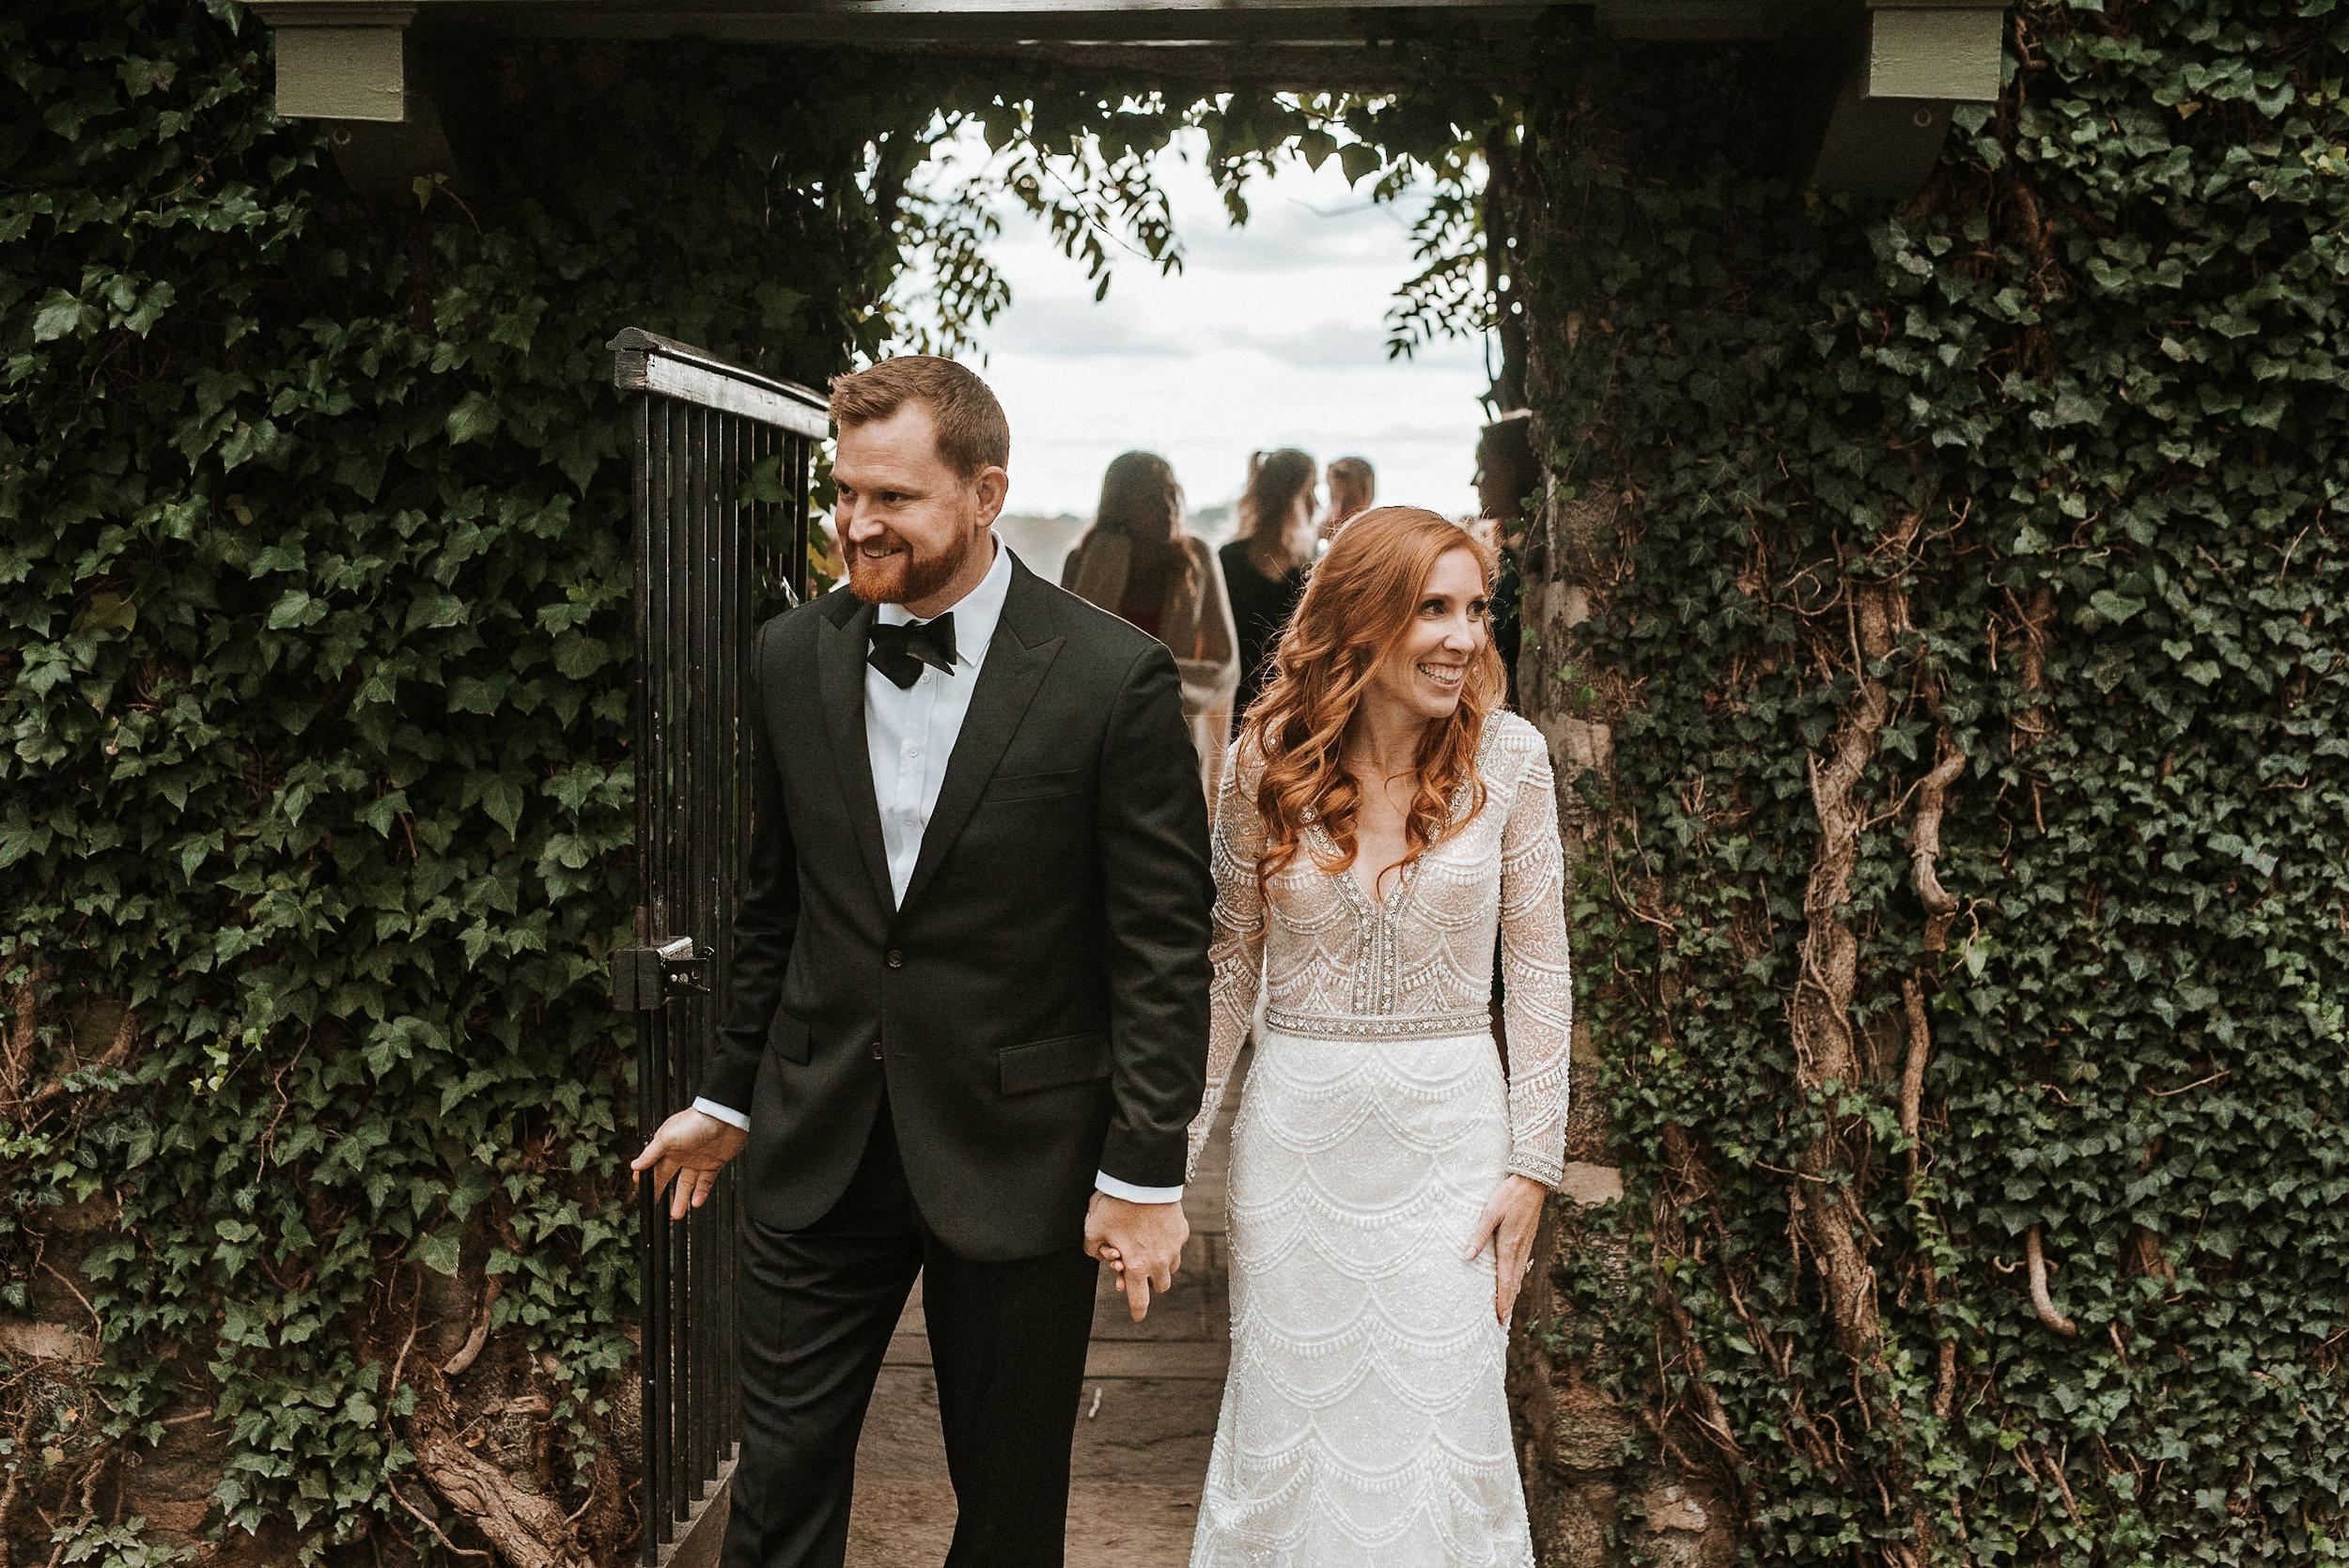 bride and groom enter the ceremony at Goodstone Inn & Restaurant